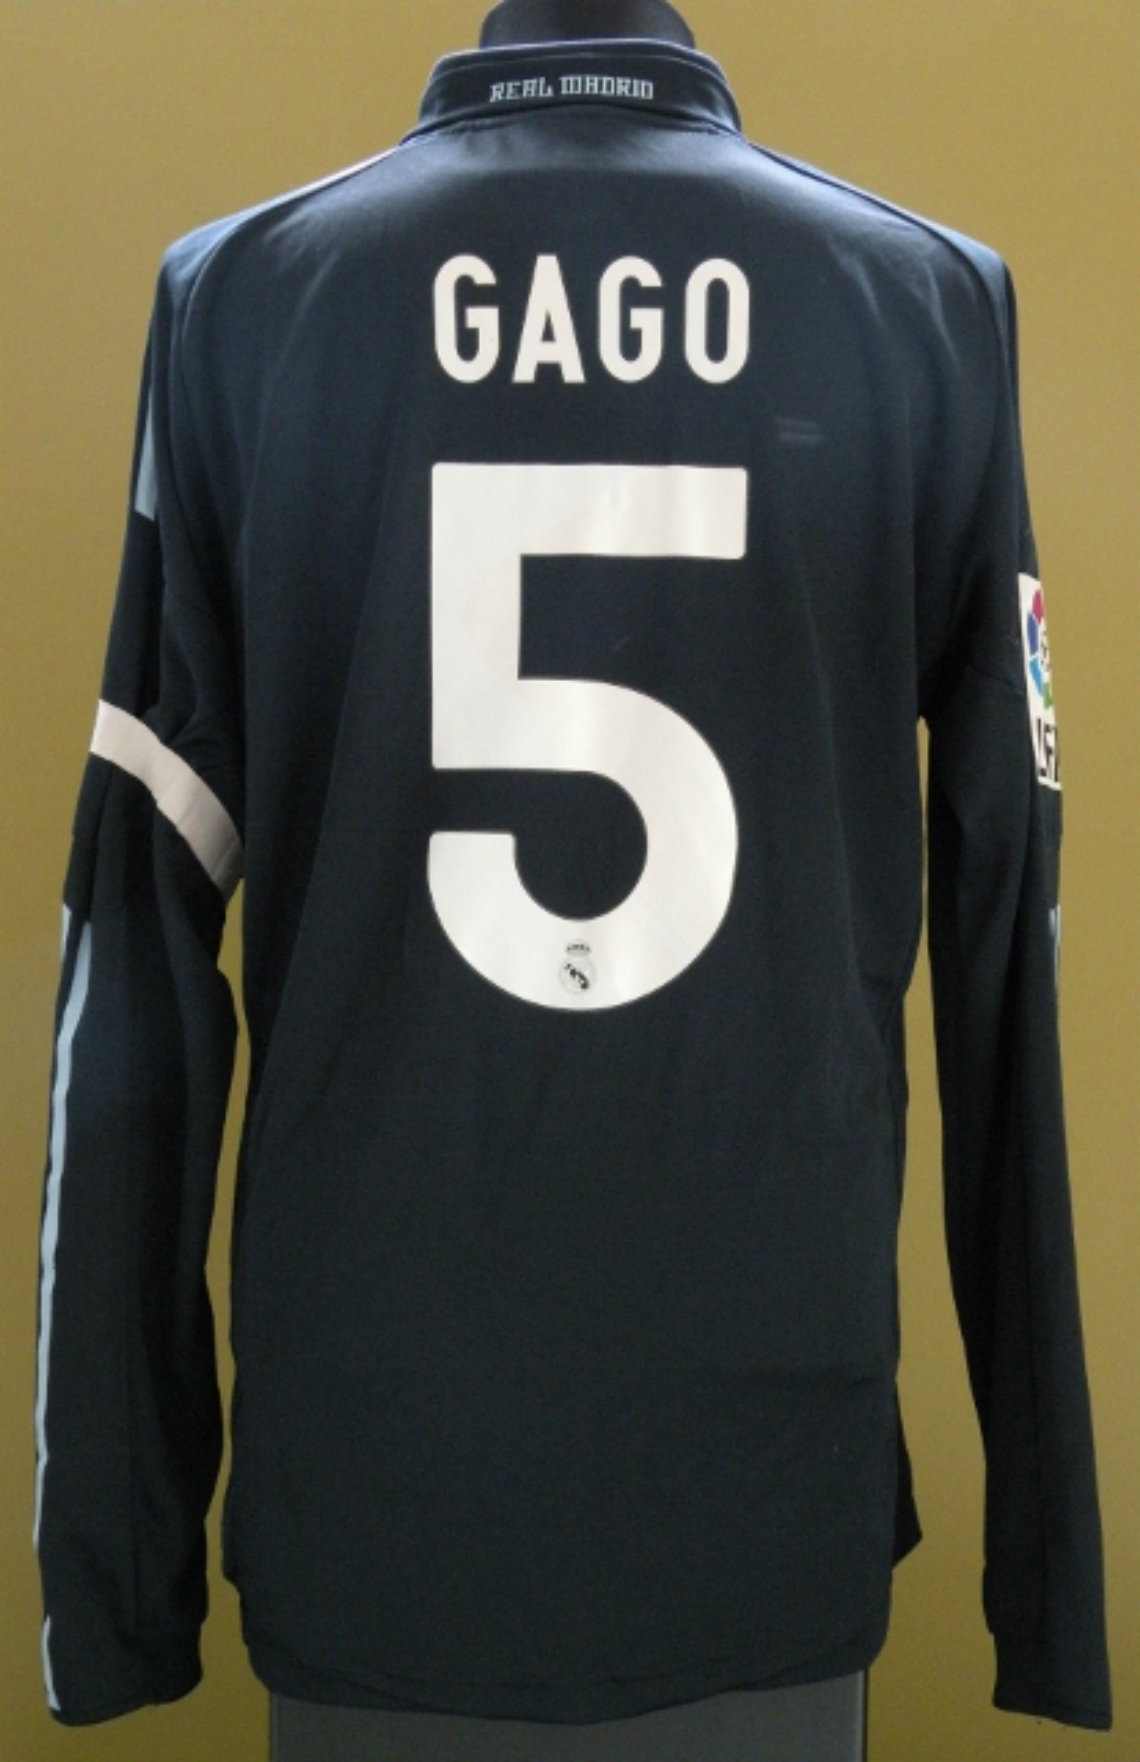 Chùm ảnh: Valladolid jersey (7)